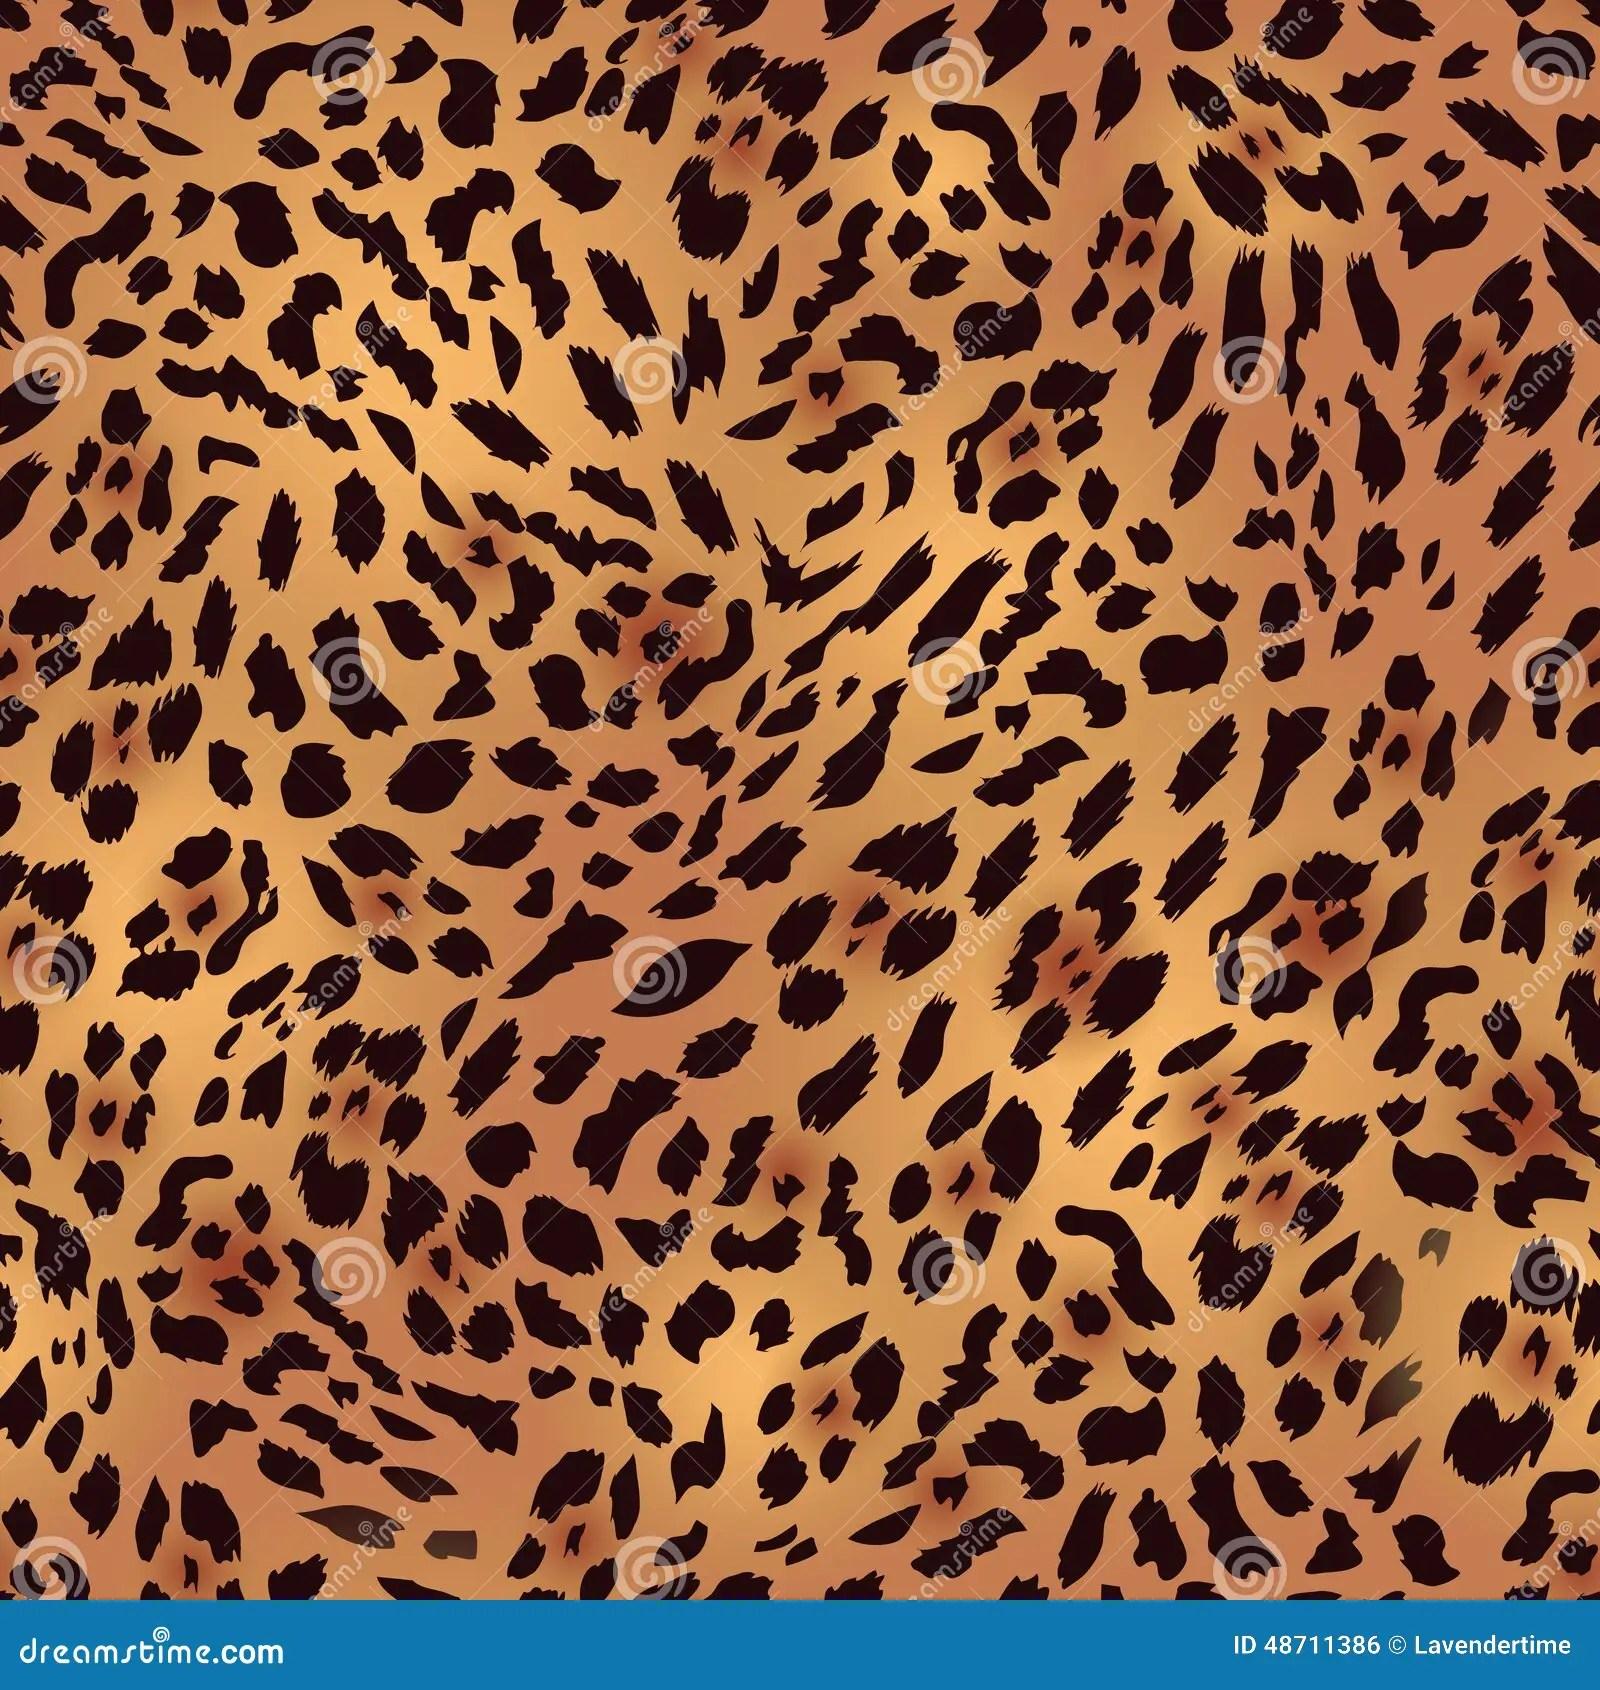 Leopard Animal Print Wallpaper Safari Leopard Fur Seamless Vector Print Stock Vector